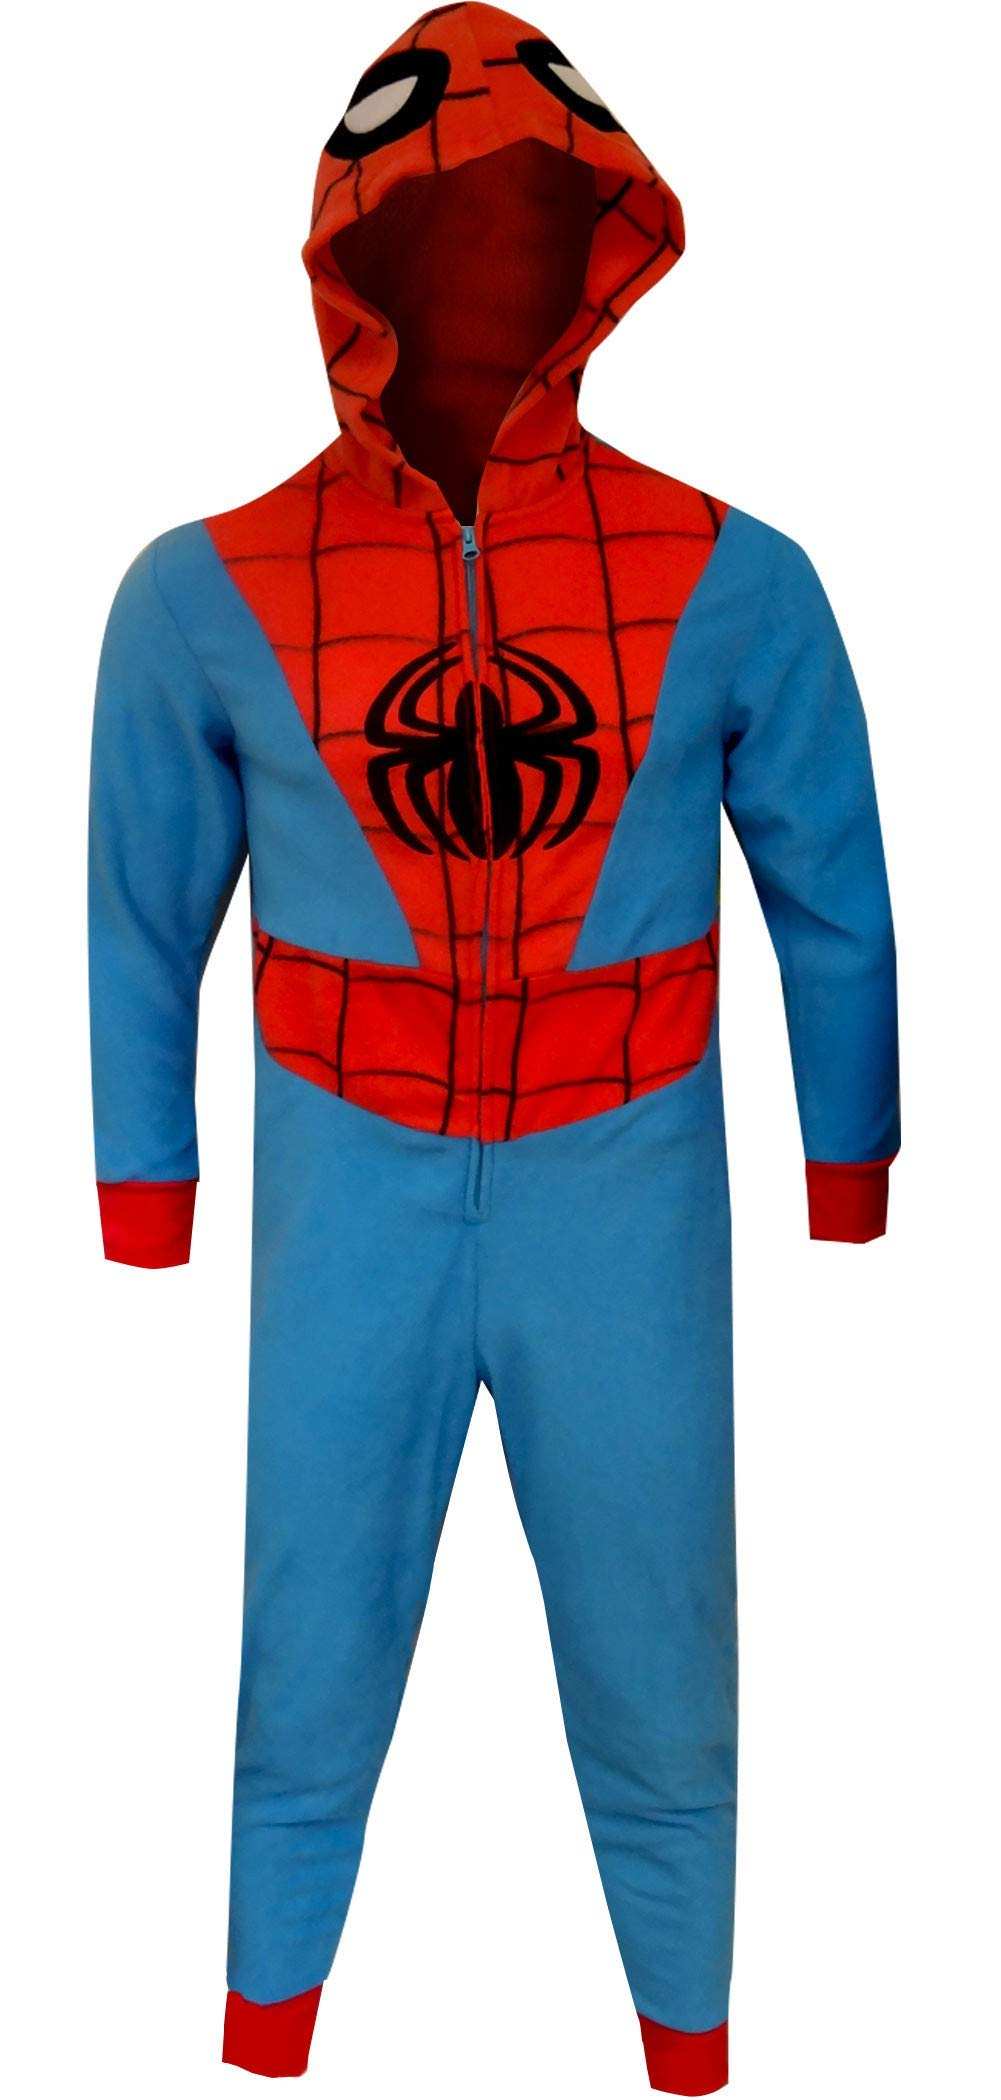 MJC Men's Spiderman Hooded Fleece One Piece Slim Cut Pajama (3X/4X) Blue